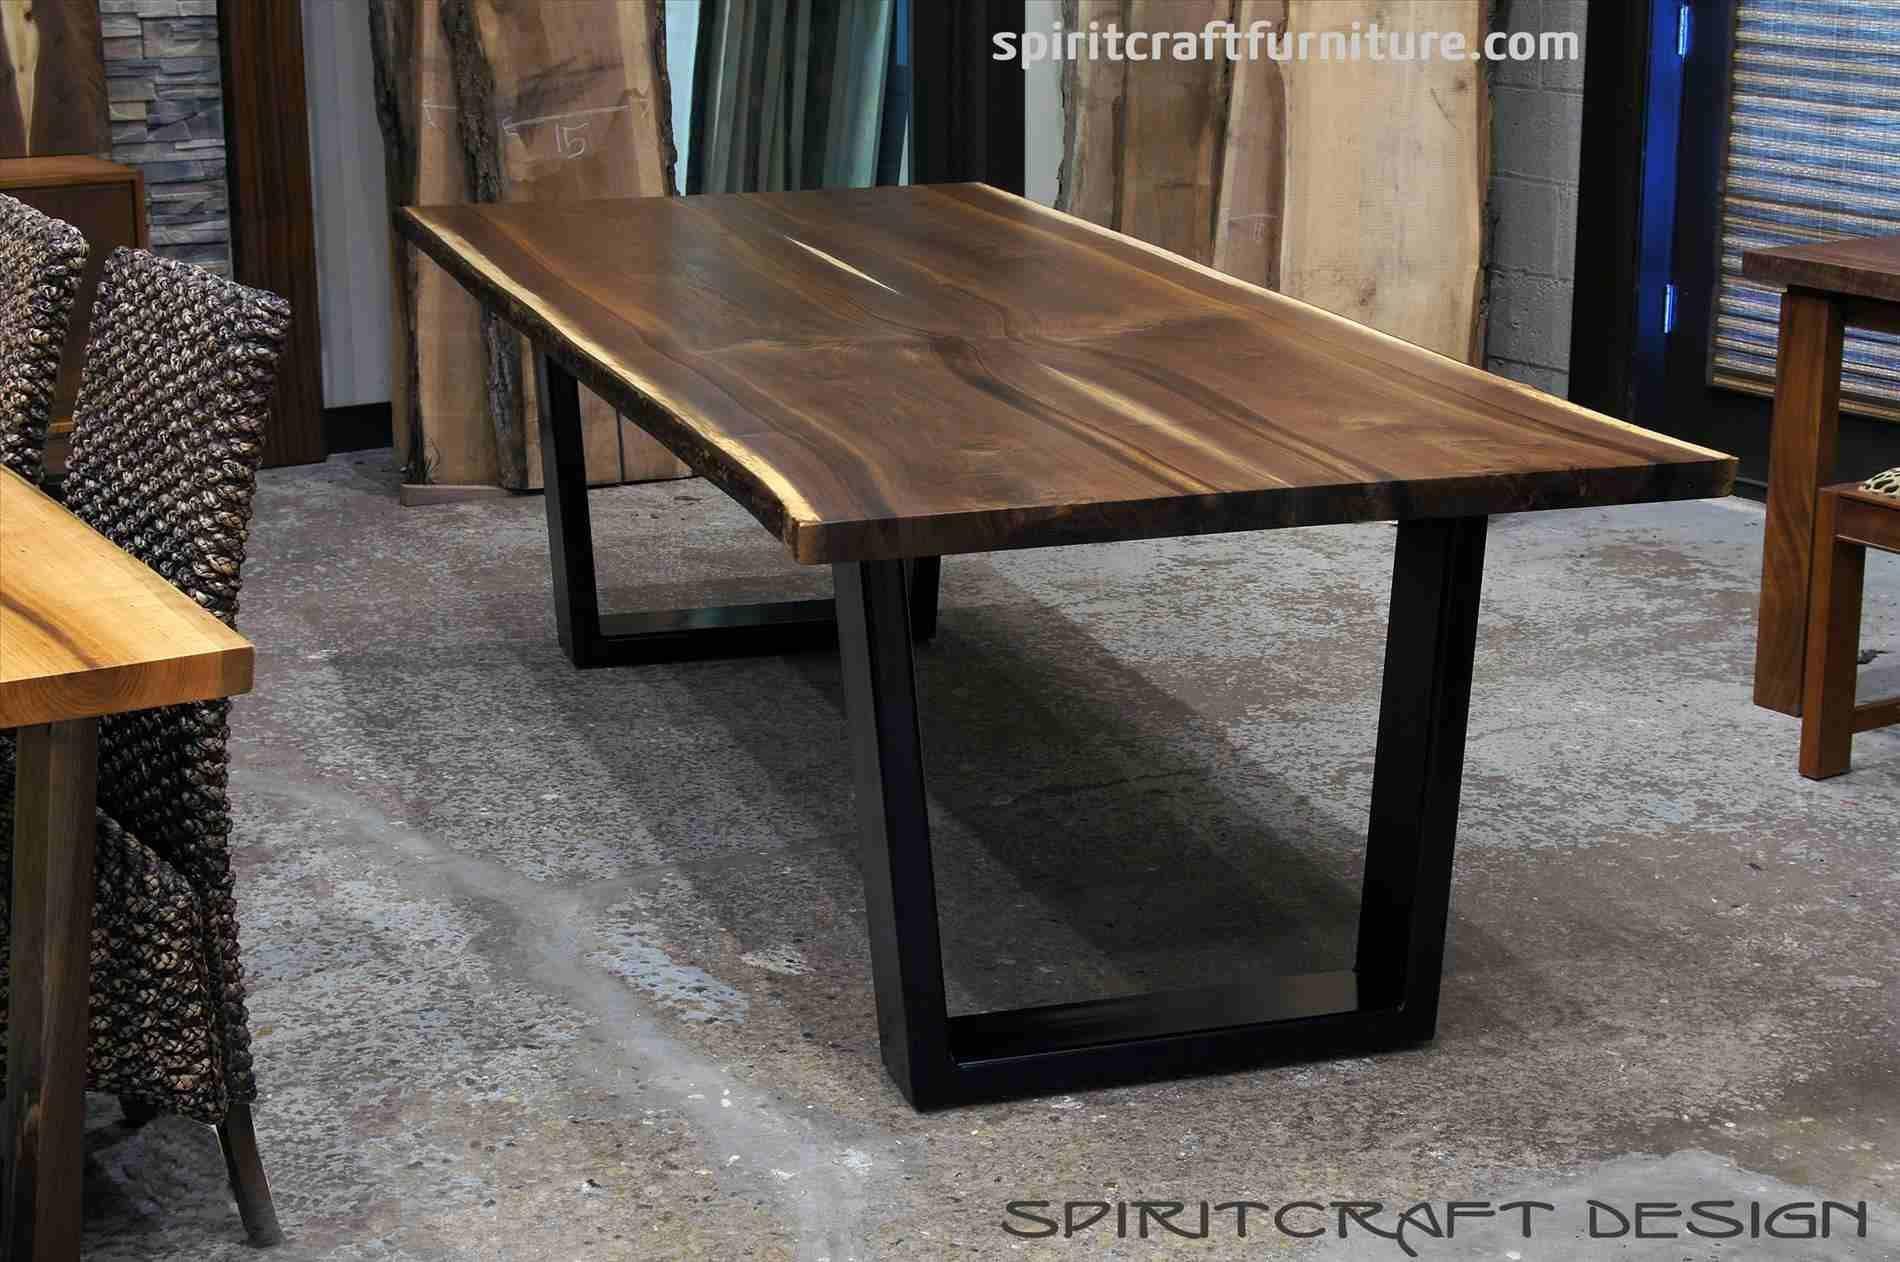 Live Edge Coffee Table Legs Full Size Of Impressive Image Design Walnut Pee Tablebench